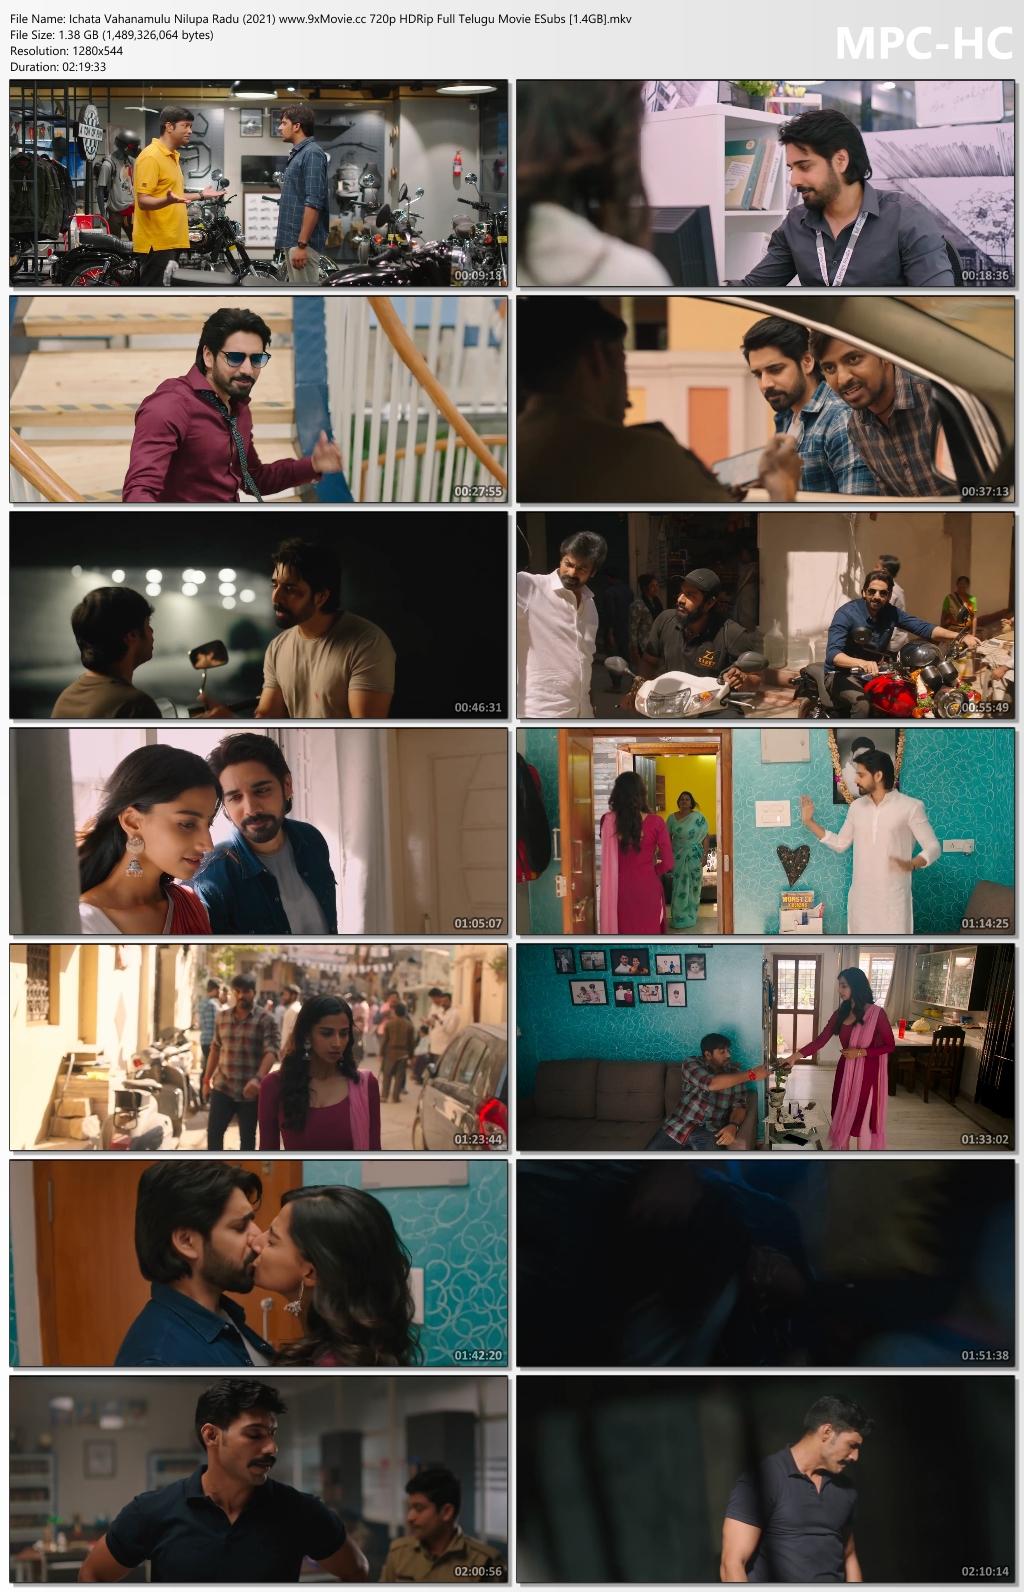 Ichata-Vahanamulu-Nilupa-Radu-2021-www-9x-Movie-cc-720p-HDRip-Full-Telugu-Movie-ESubs-1-4-GB-mkv